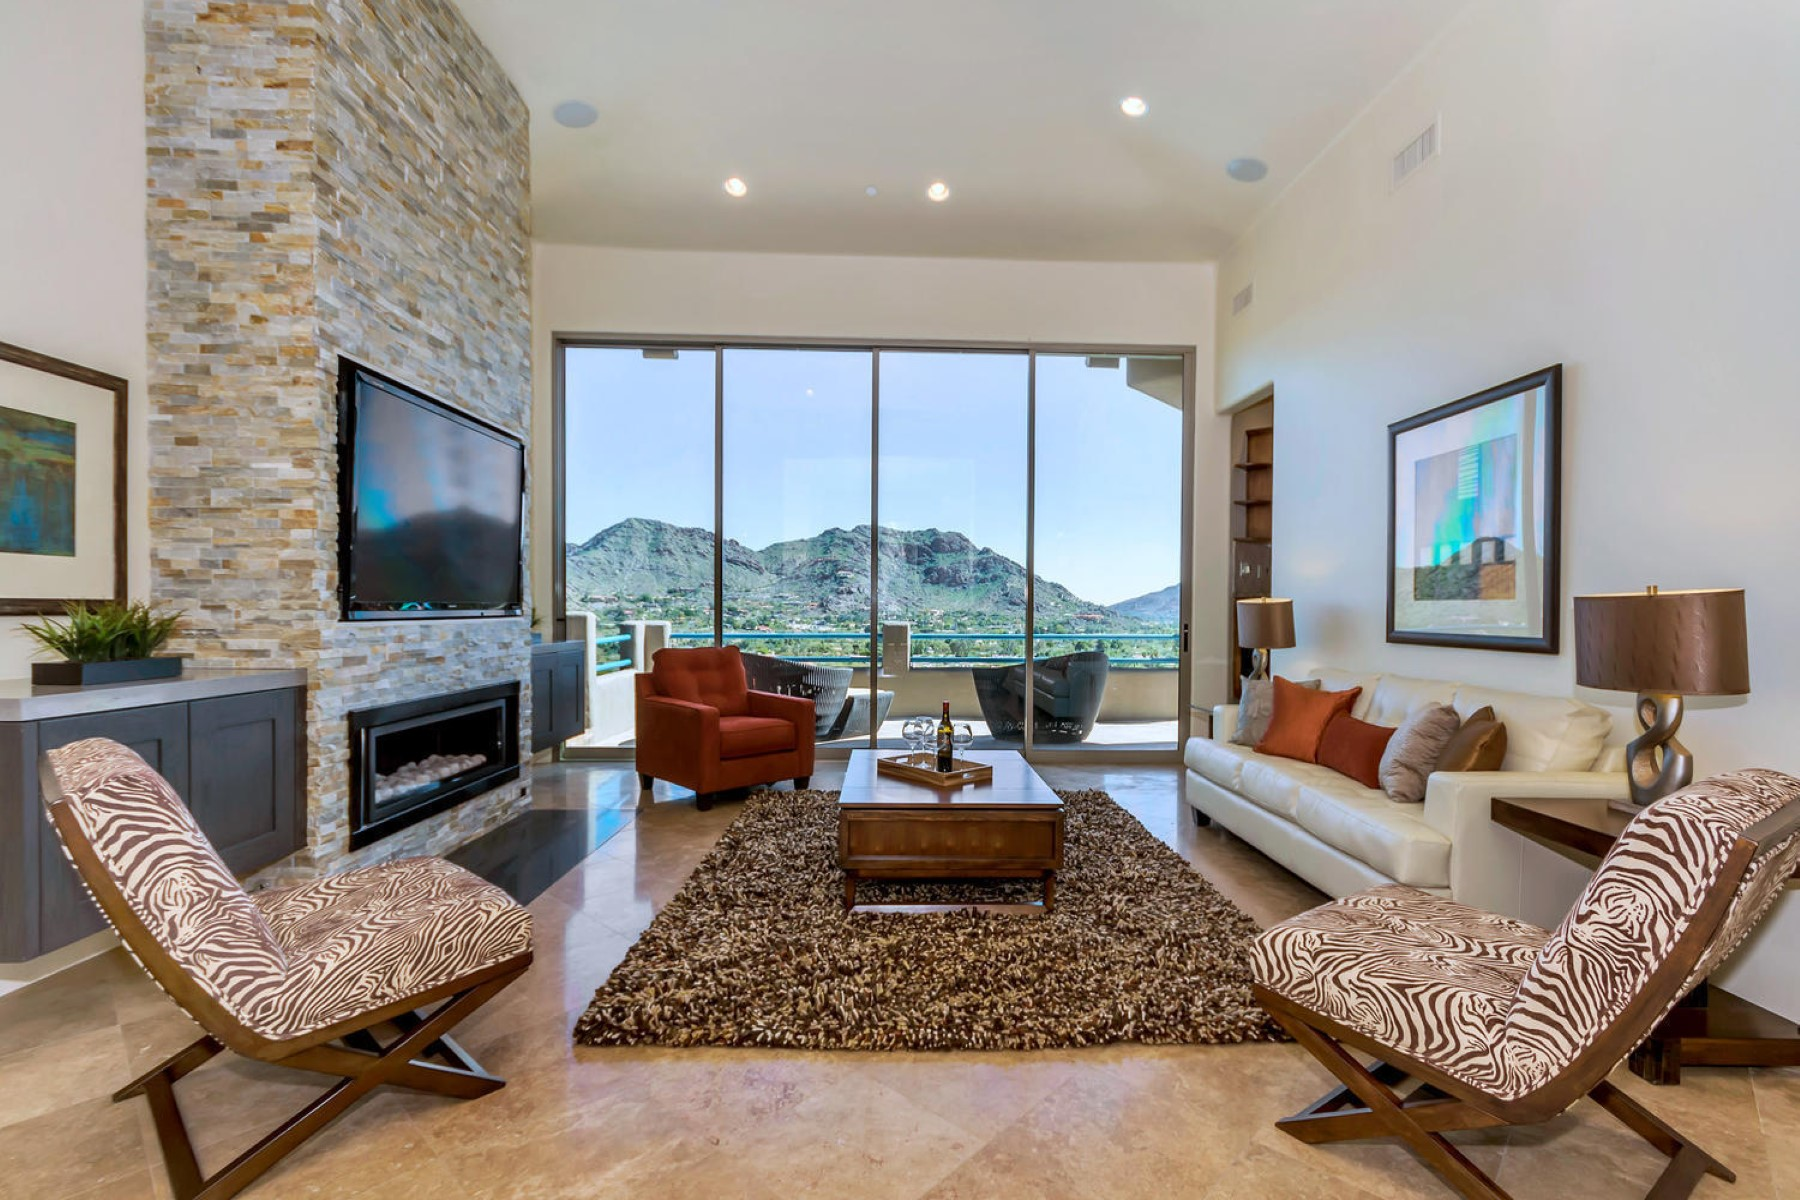 Tek Ailelik Ev için Satış at Gorgeous home with the most beautiful views in all of Paradise Valley 4748 E White Dr Paradise Valley, Arizona, 85253 Amerika Birleşik Devletleri